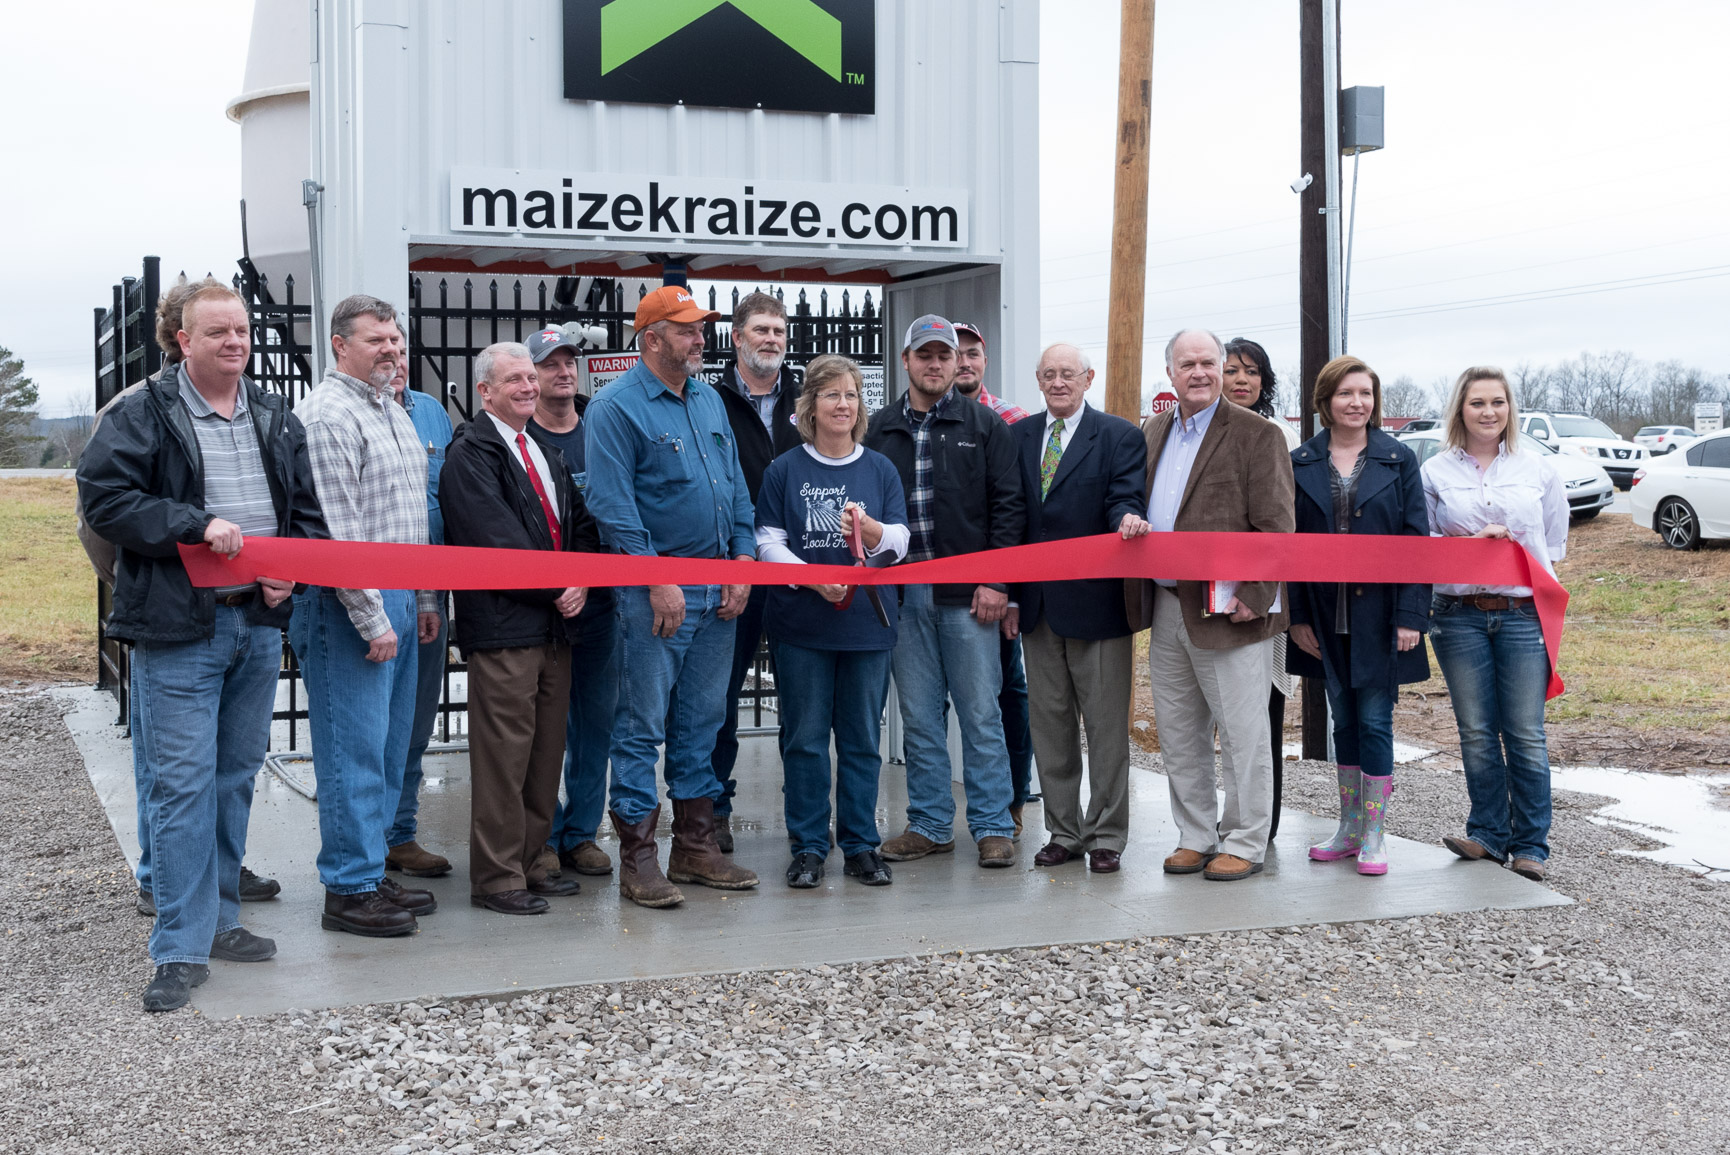 maize kraize ribbon cutting event for self-service corn vending system in Russelville, AL